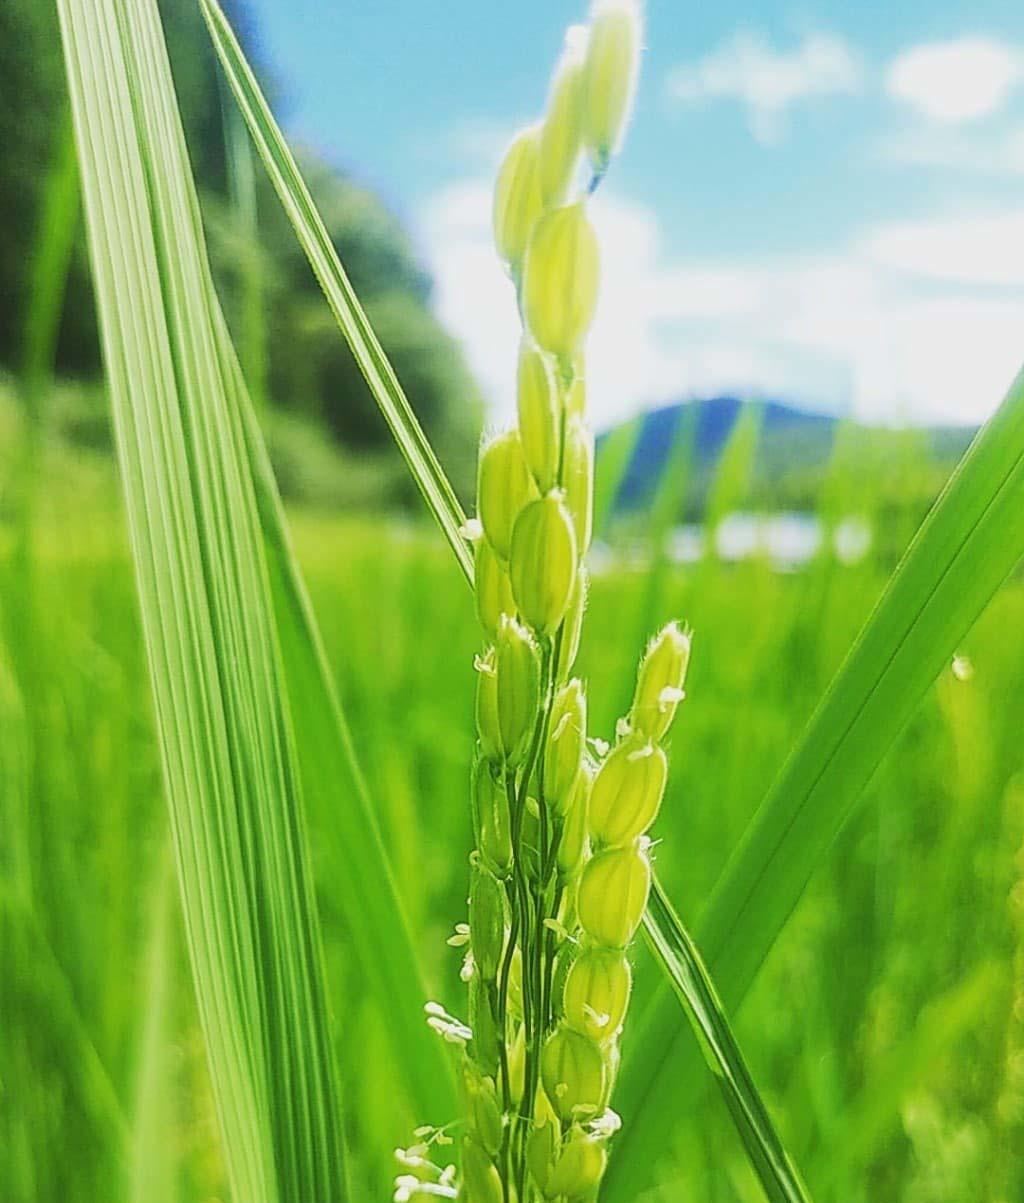 髙橋慎也 -farm to table-_d0210537_13104137.jpg